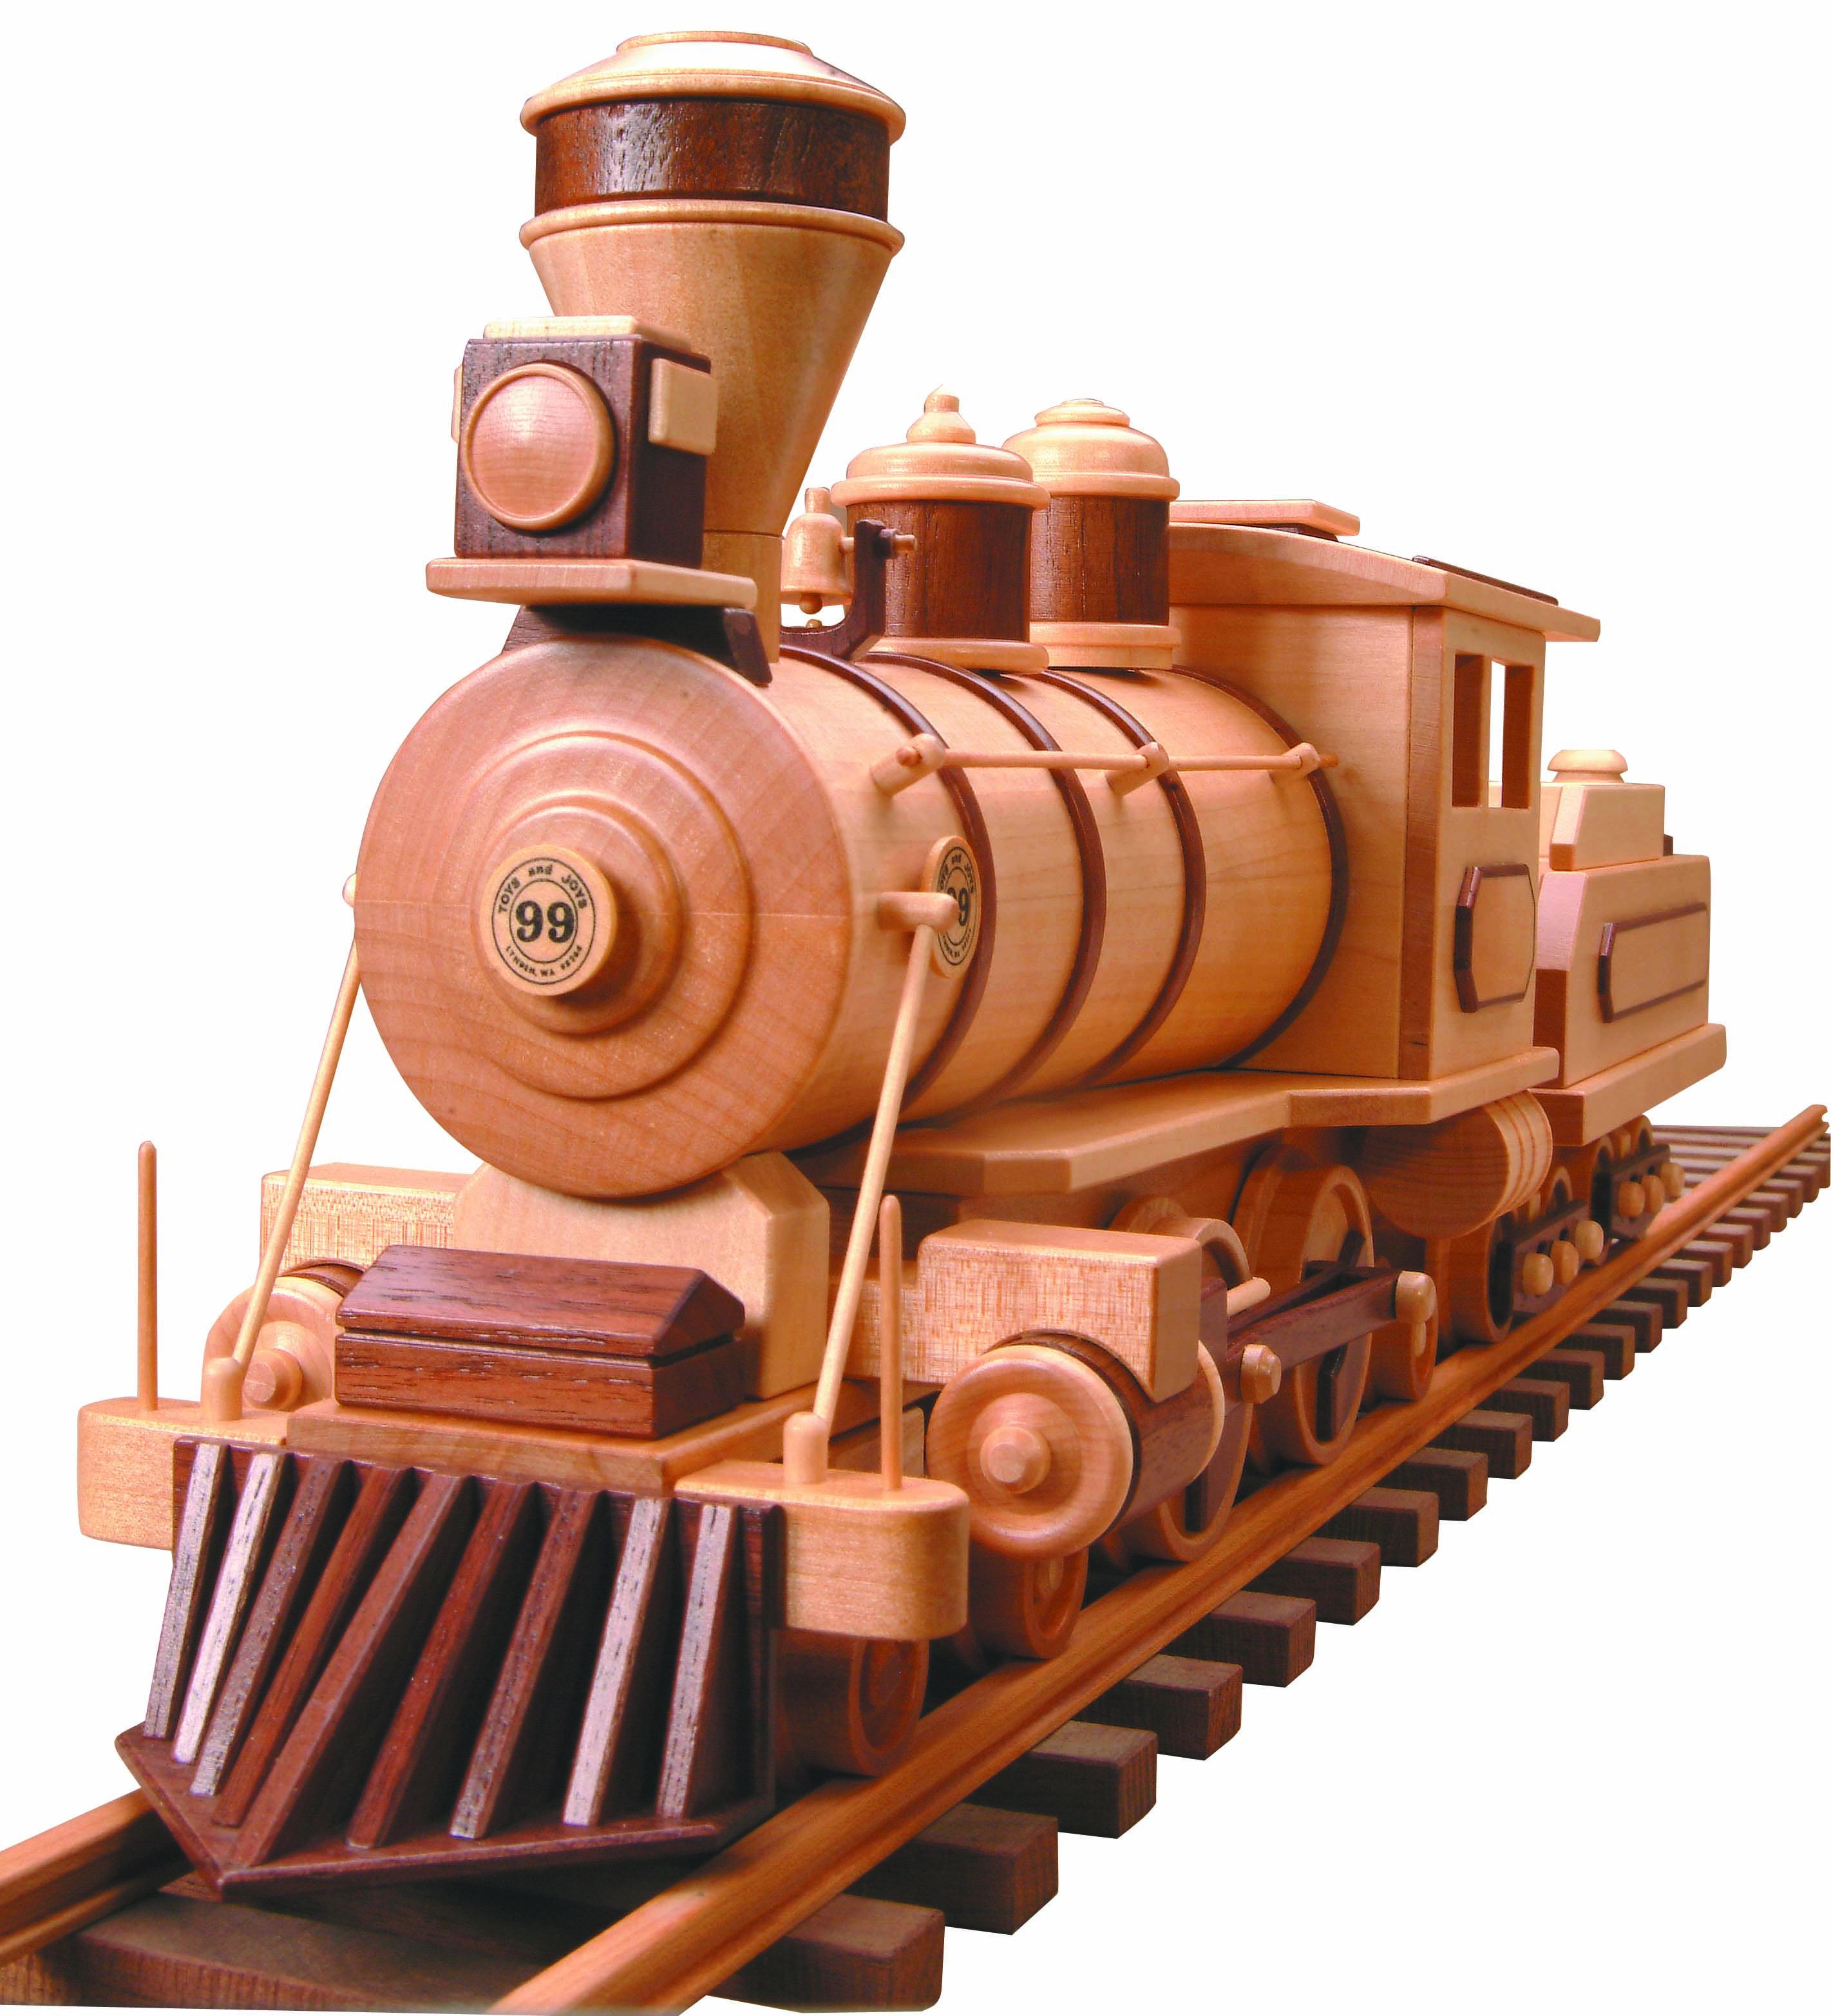 99 & Tender (Wood Burner) Wooden toys